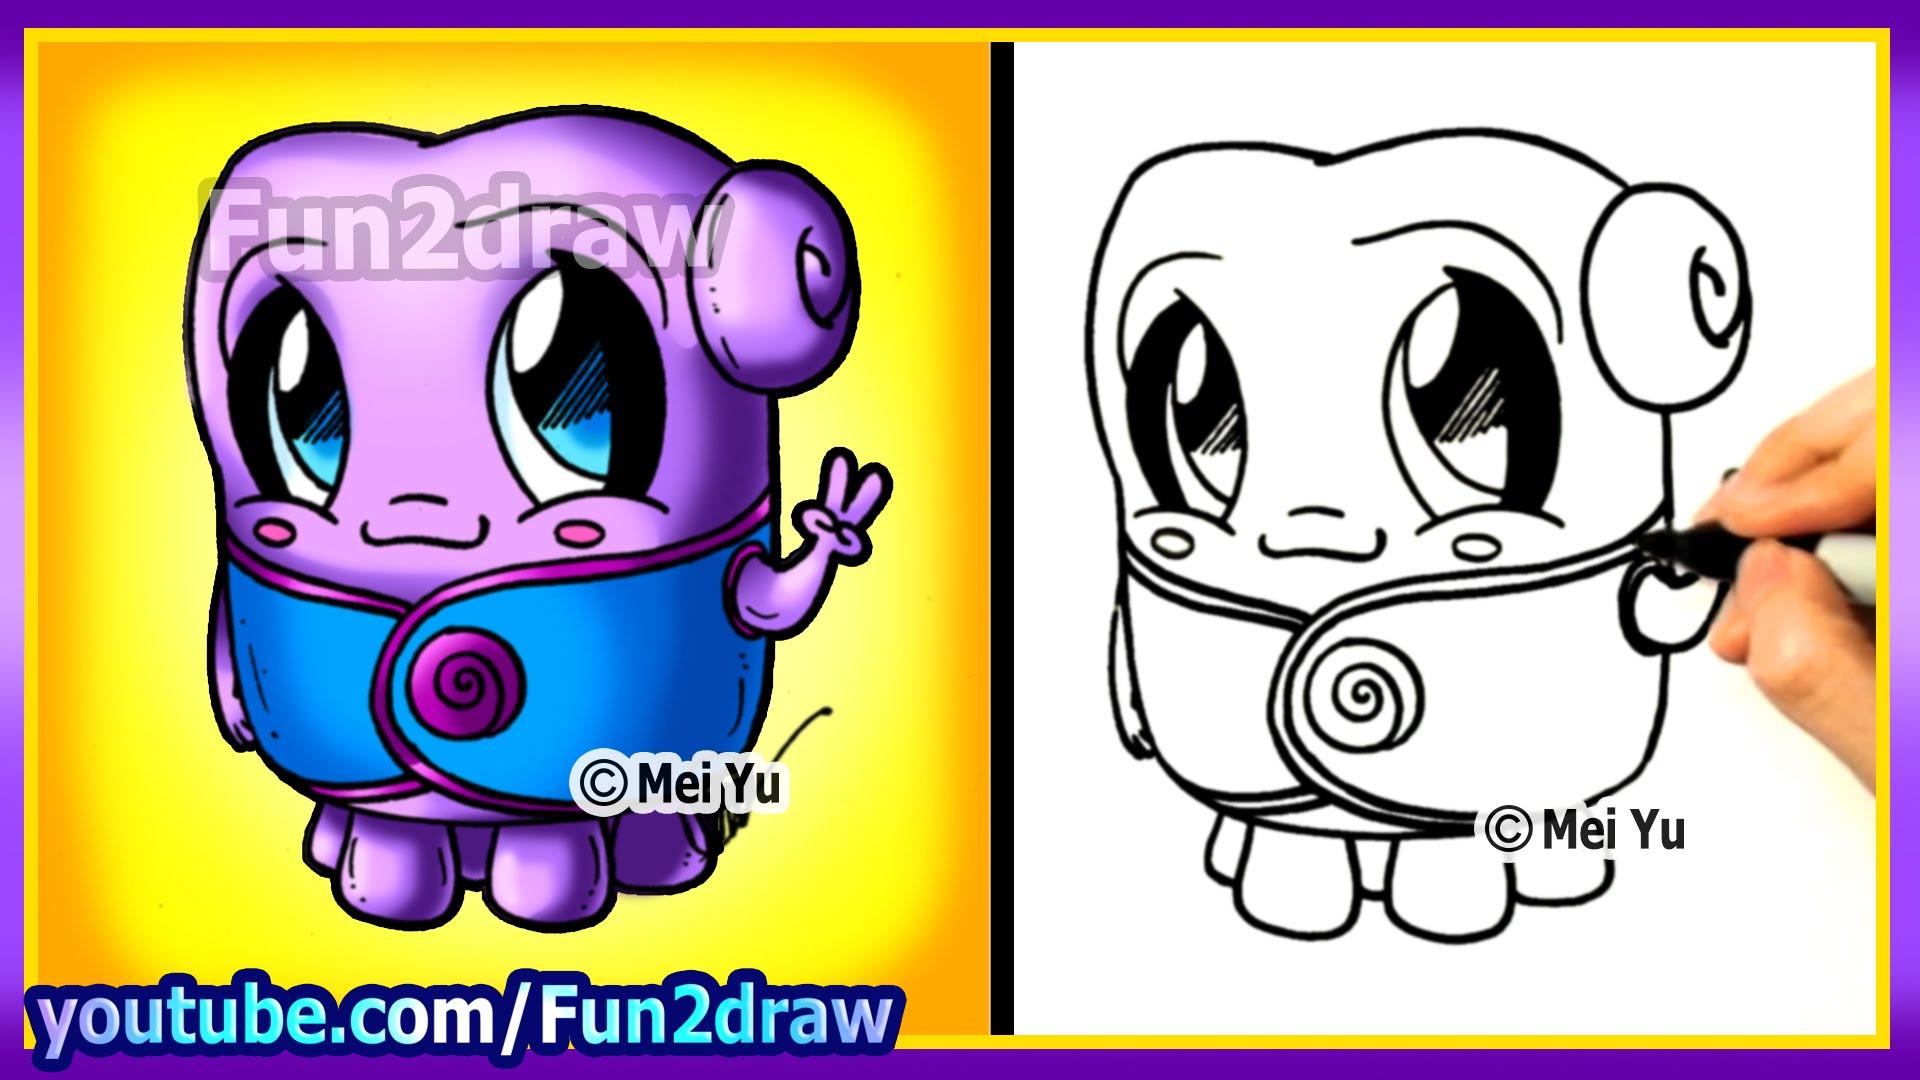 Fun2draw Drawing At Getdrawings Com Free For Personal Use Fun2draw